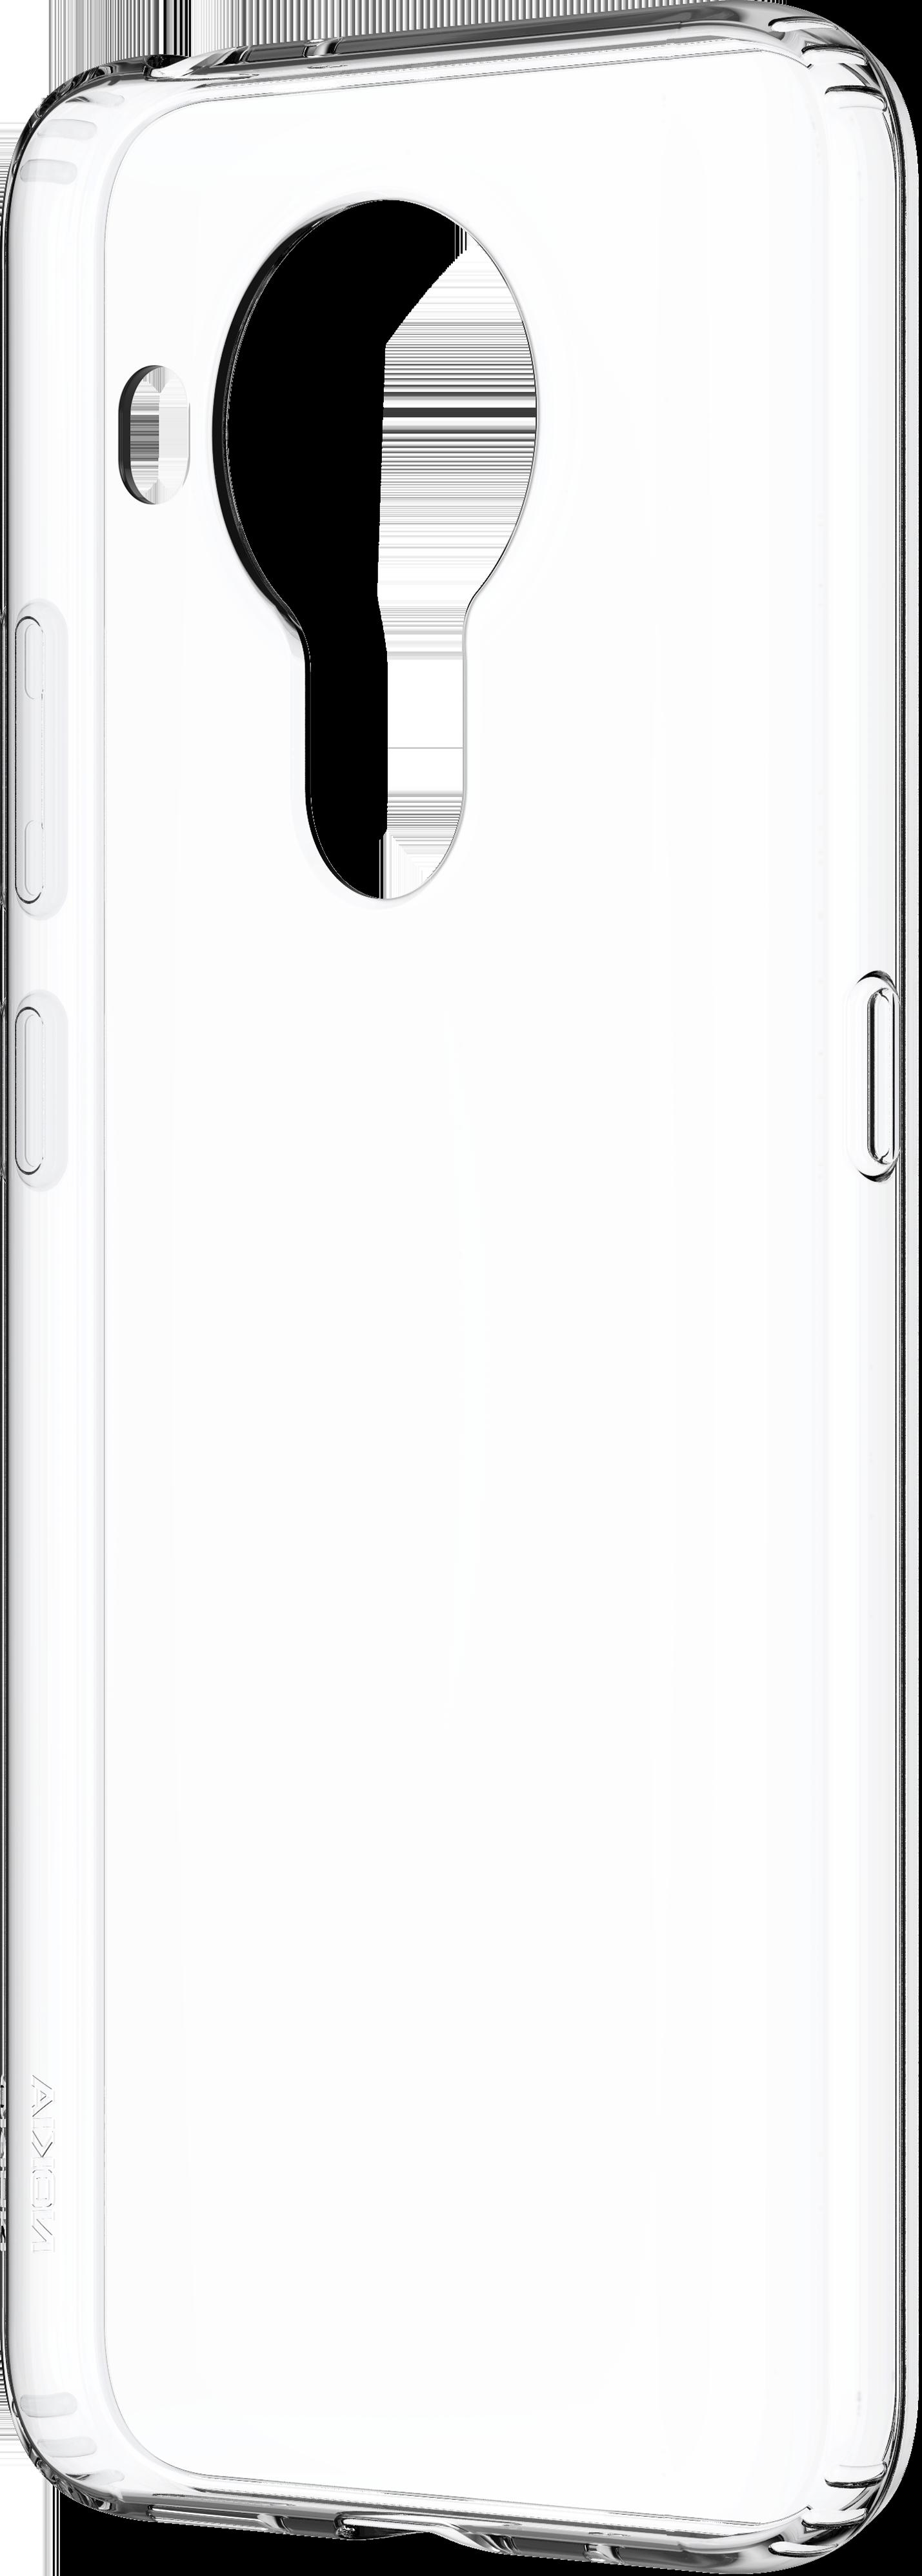 Nokia 5.4 clear case